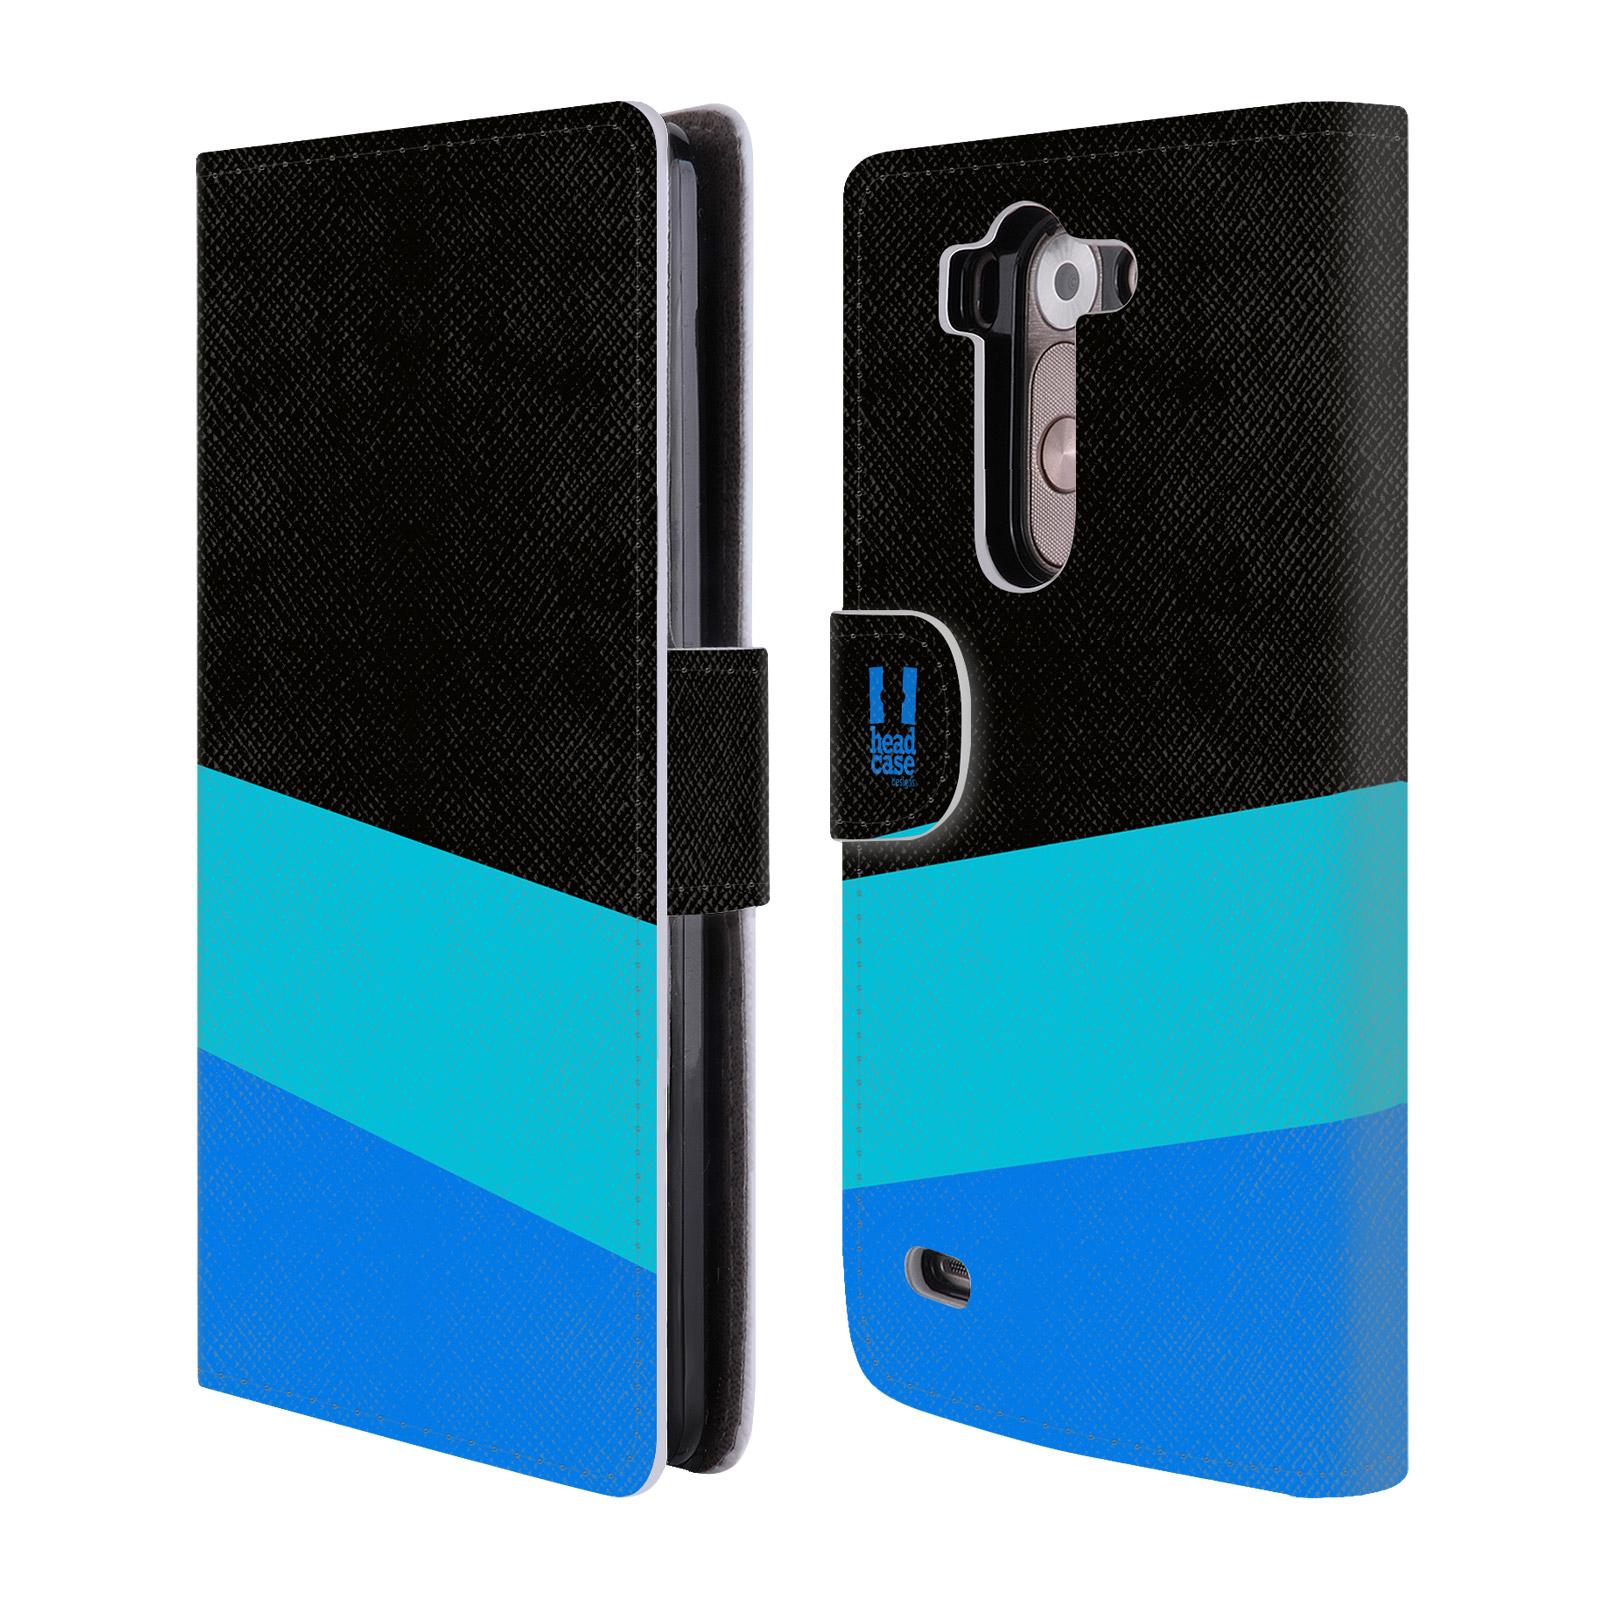 HEAD CASE Flipové pouzdro pro mobil LG G3s barevné tvary modrá a černá FORMAL